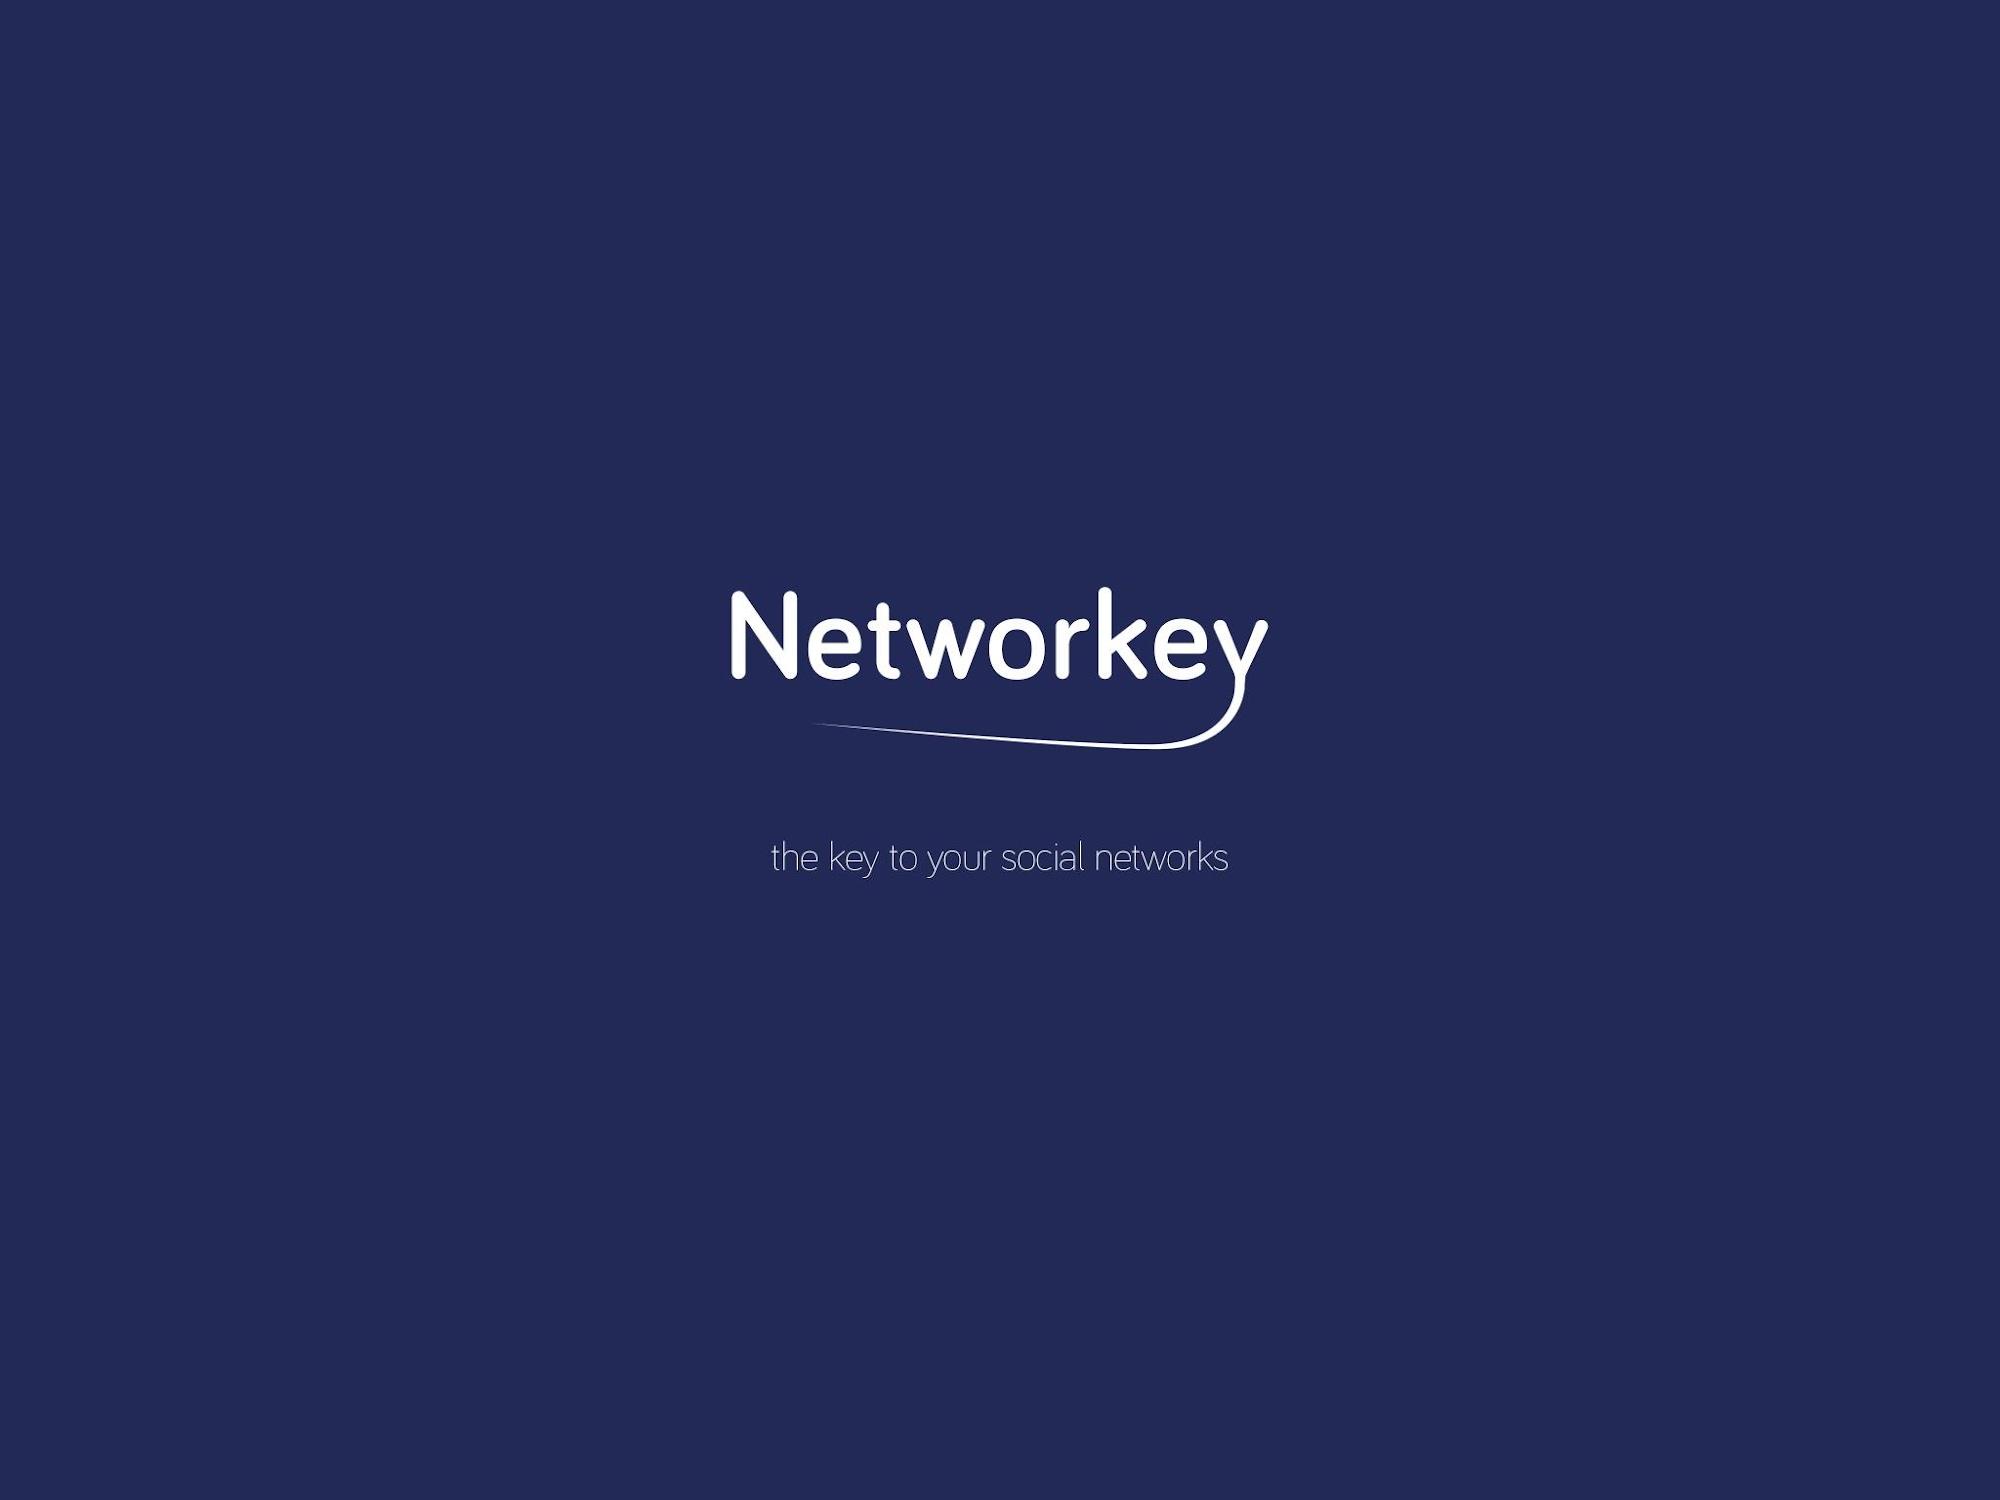 Networkey screenshot #1